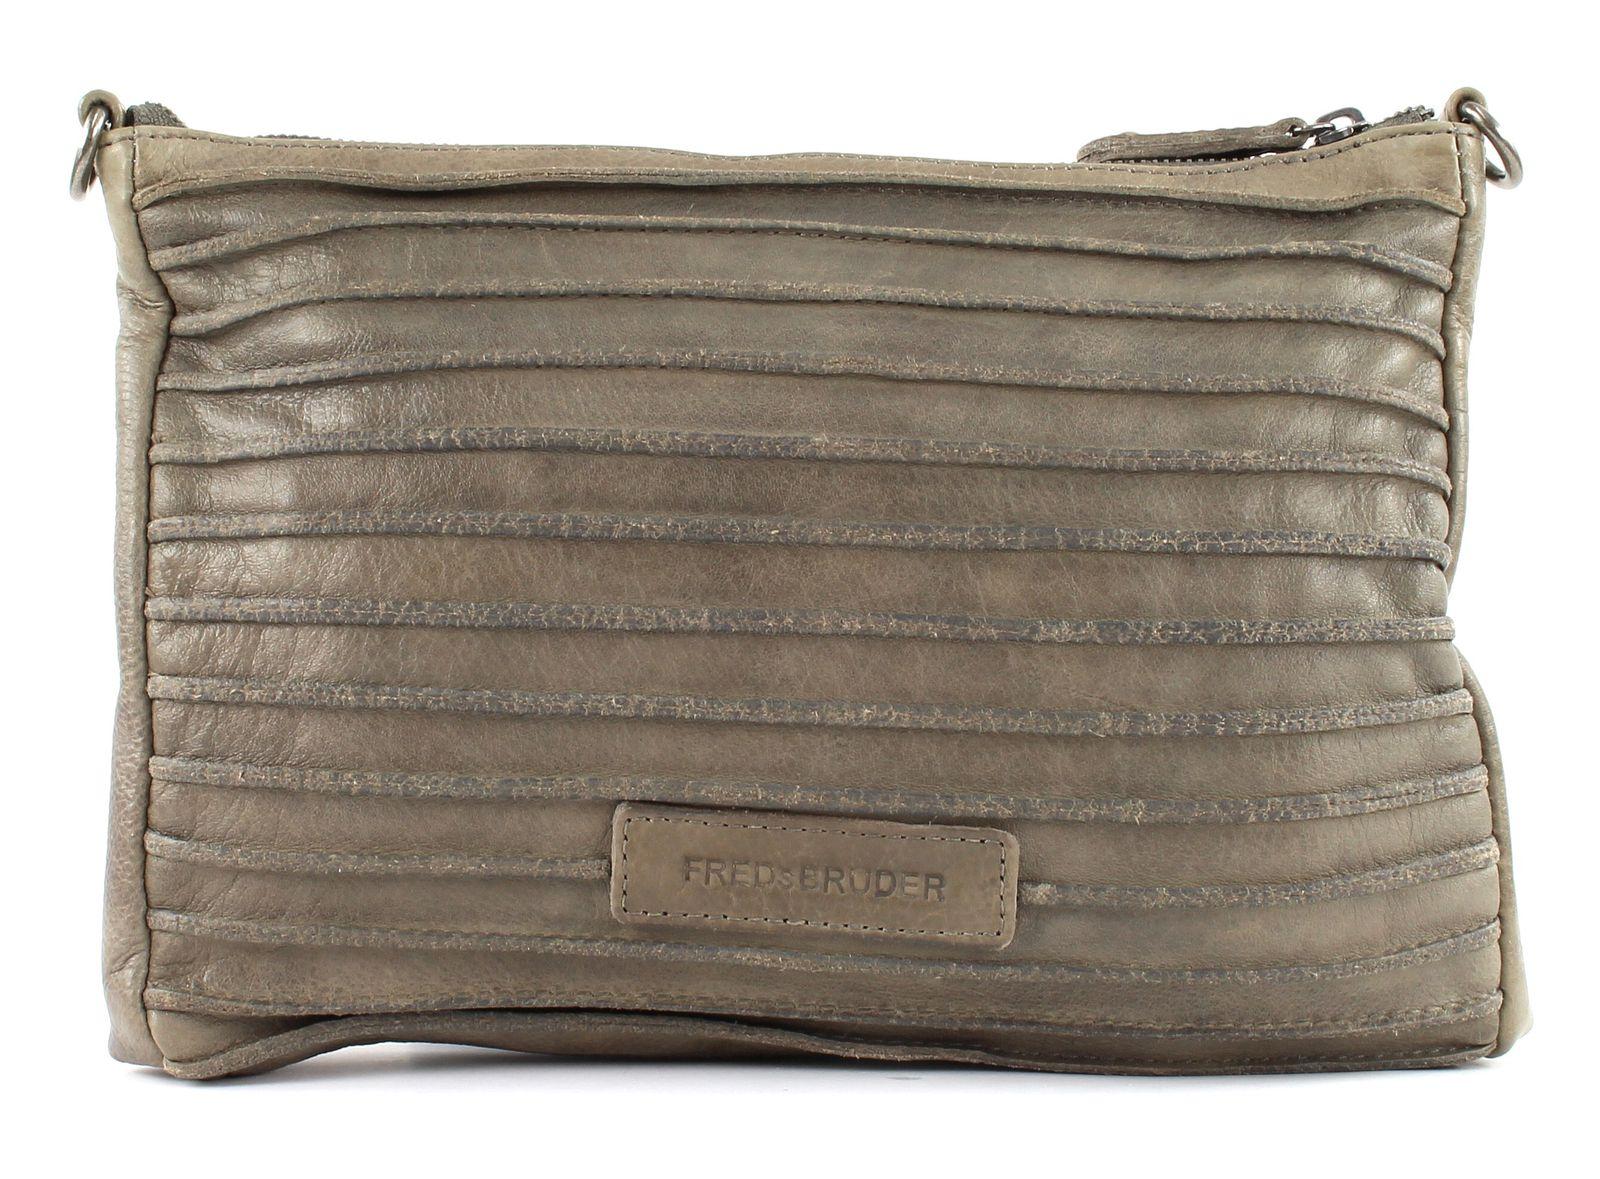 Kleidung & Accessoires Fredsbruder Spotlight Shiny Wallet Geldbörse Rose Gold Kupfer Neu